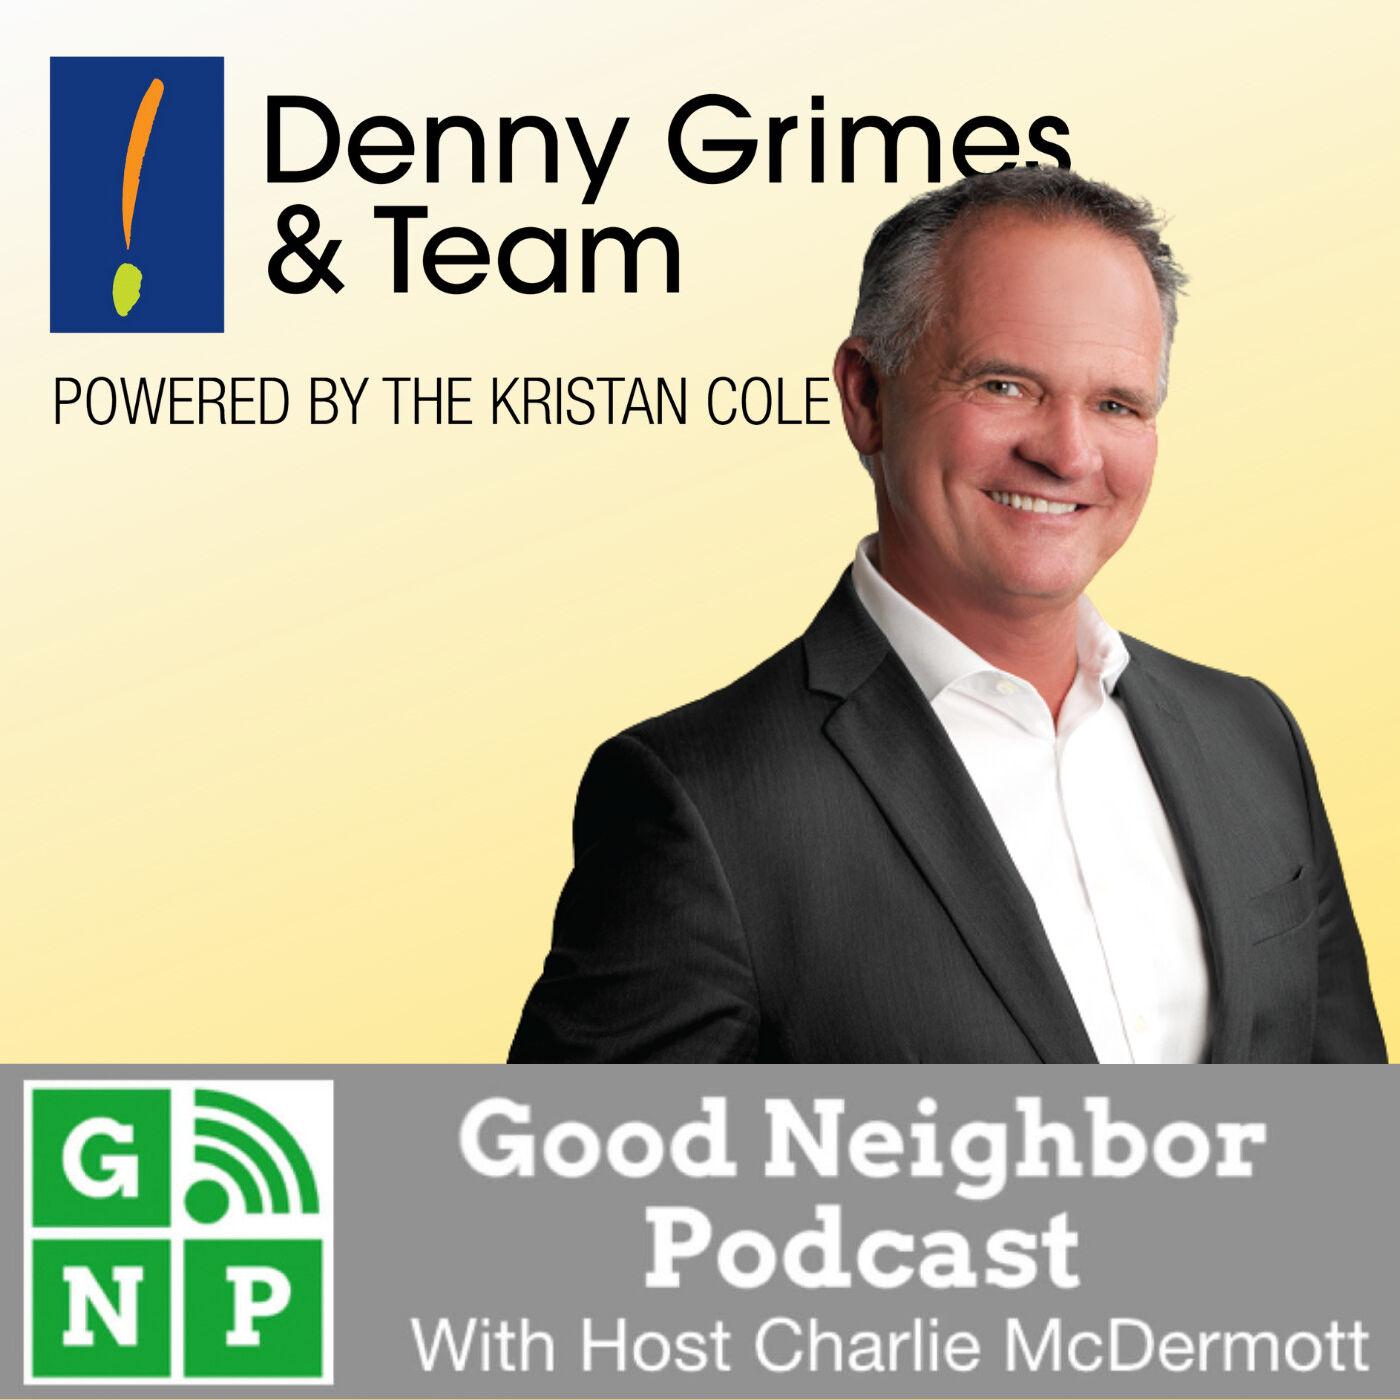 EP #525: Denny Grimes & Team at Keller Williams with Charlie McDermott